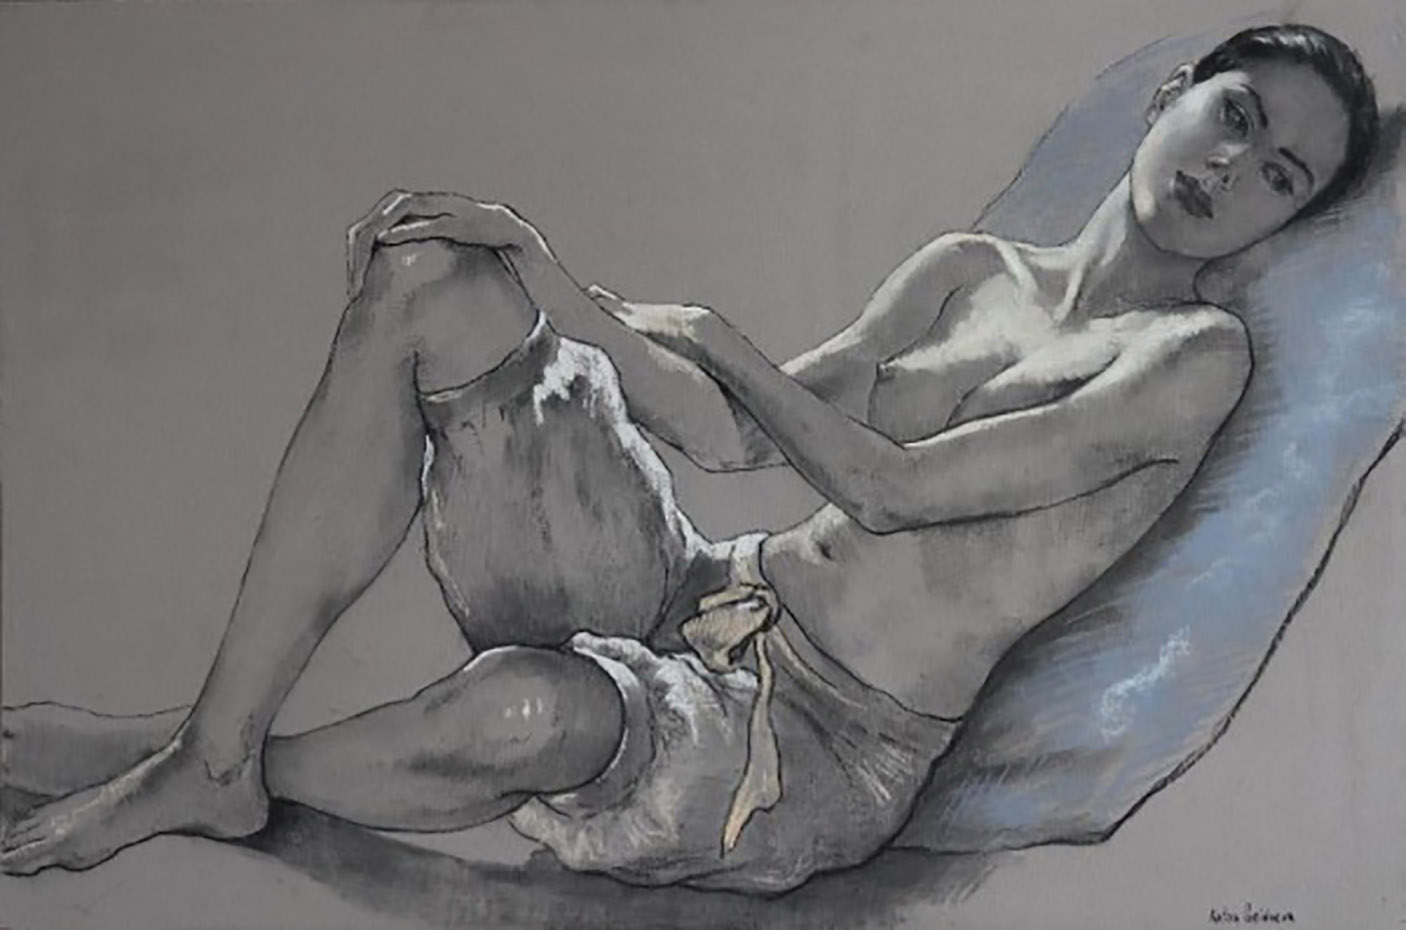 Катя Гриднева (Katya Gridneva), Картина - 36